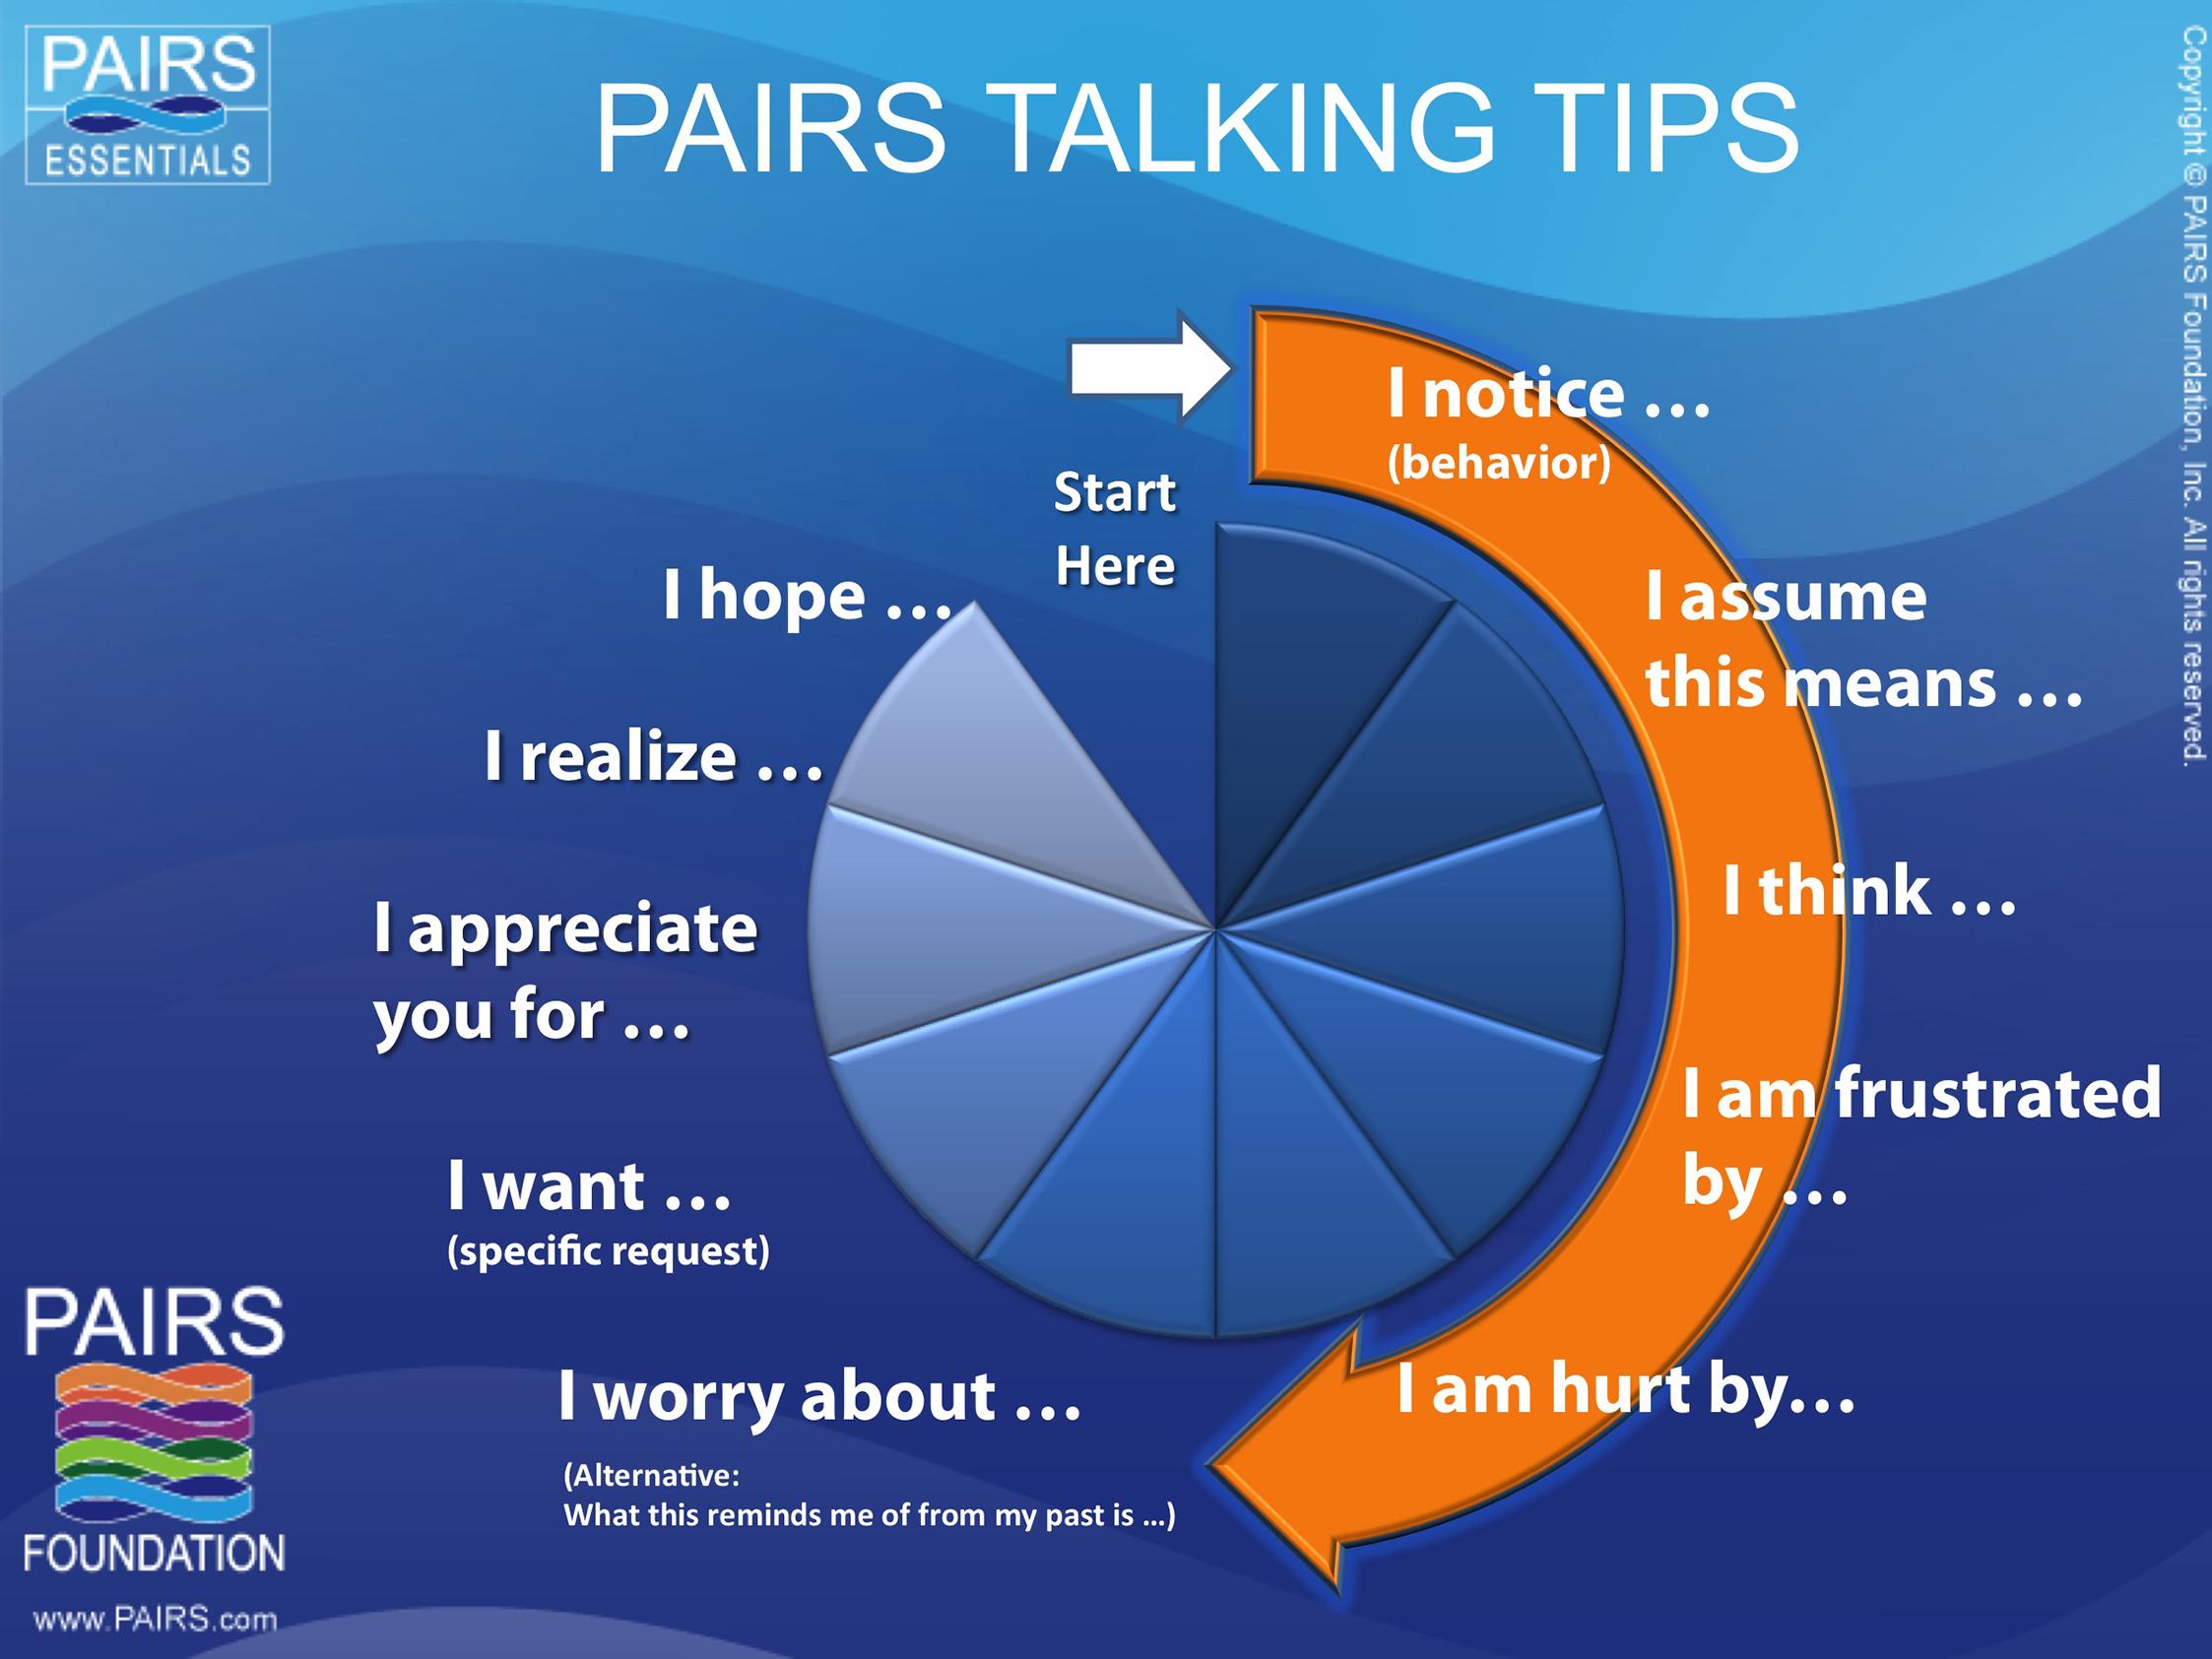 PAIRS Talking Tips